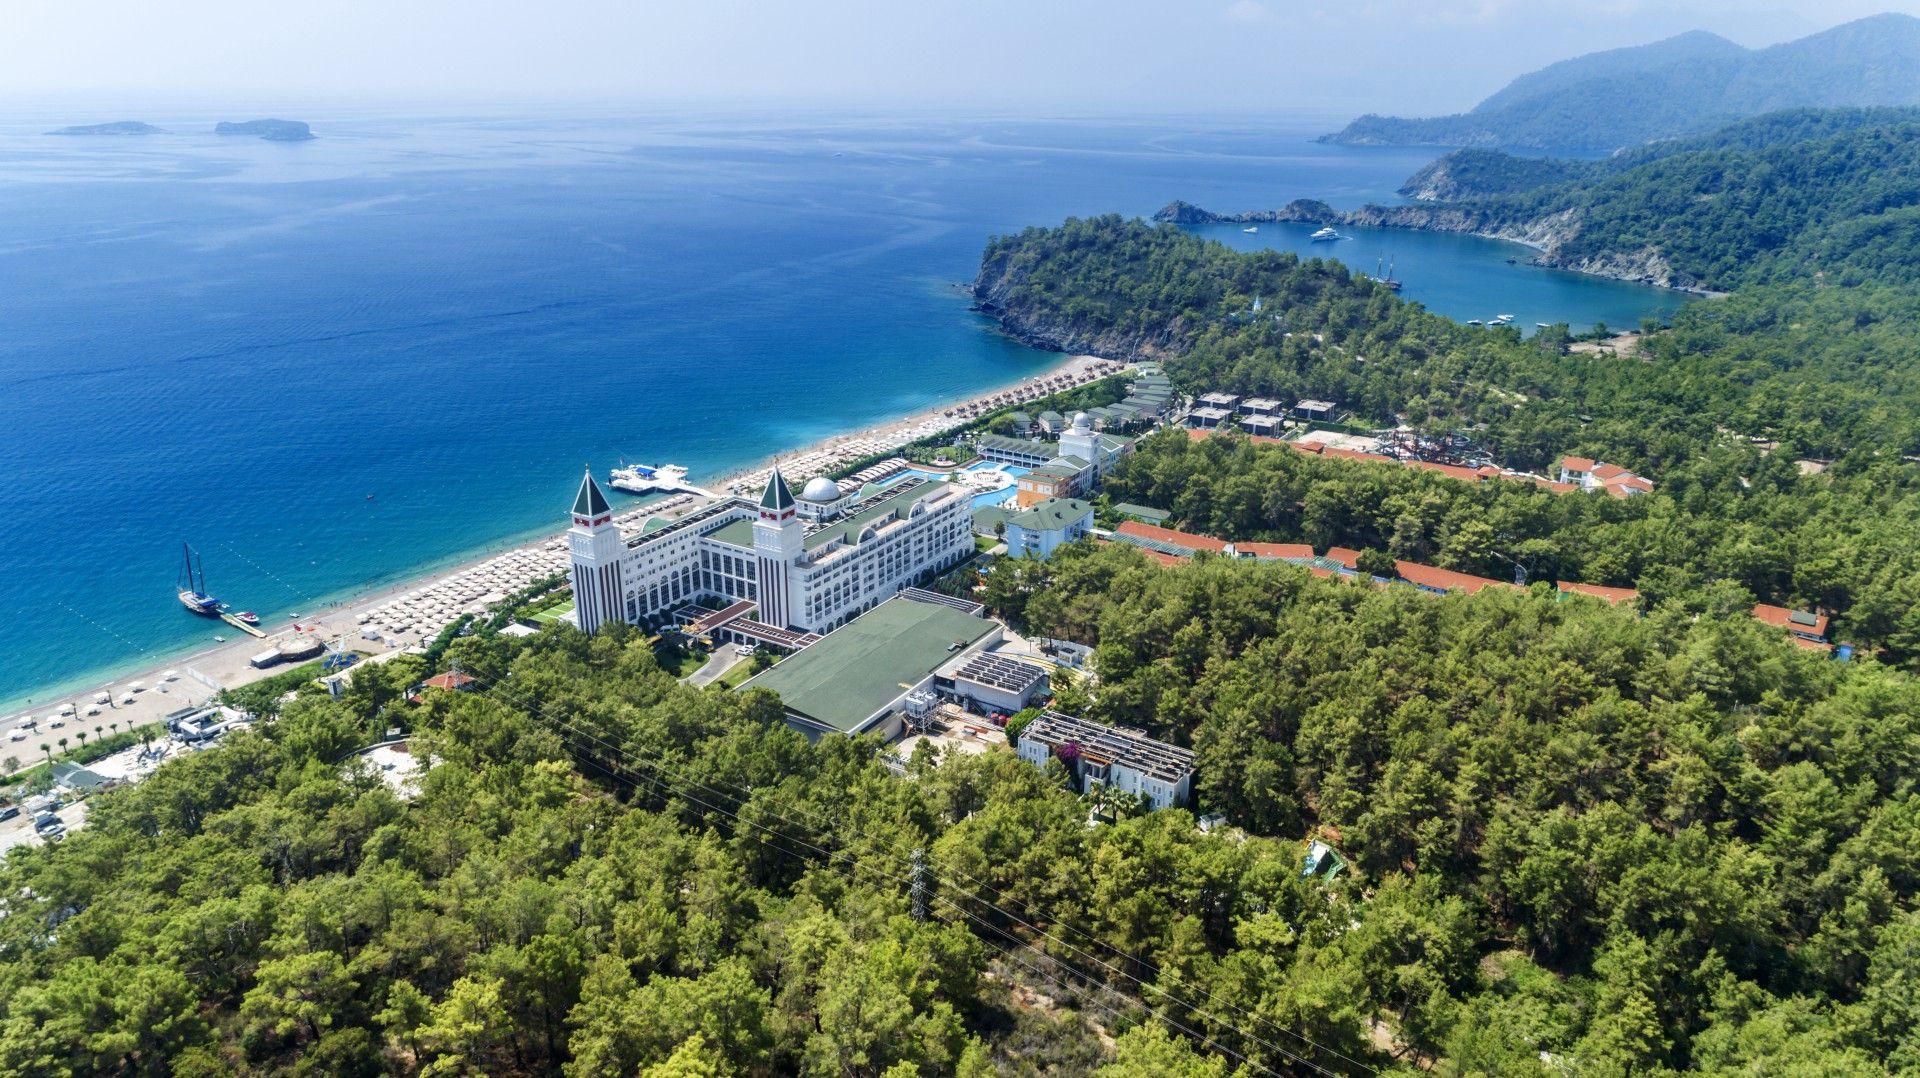 Nirvana Dolce Vita Luxury Wedding Hotel In Tekirova Antalya Hotel Wedding Hotel Hotel Place